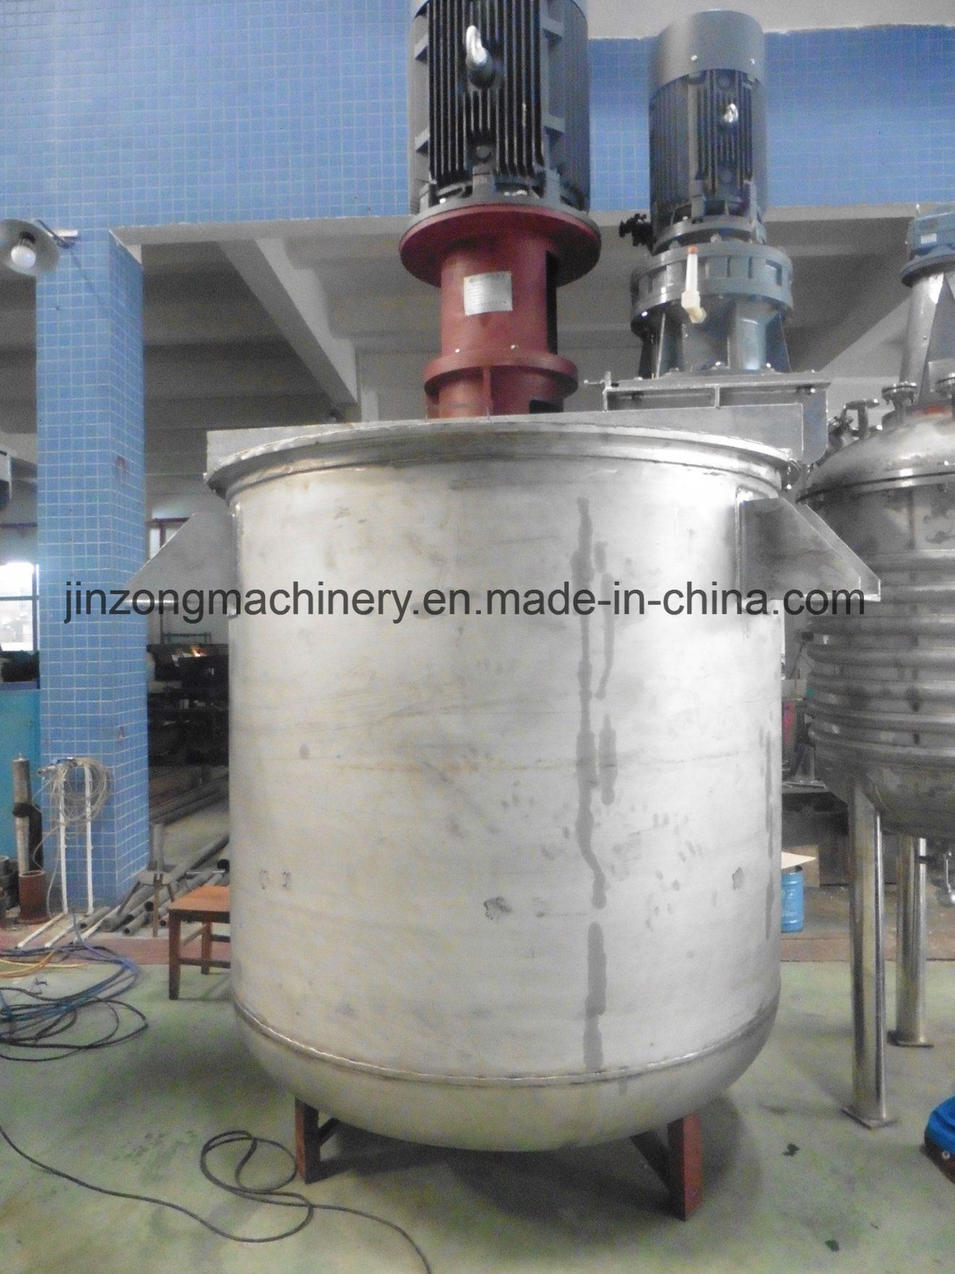 China High Speed Paint Mixer